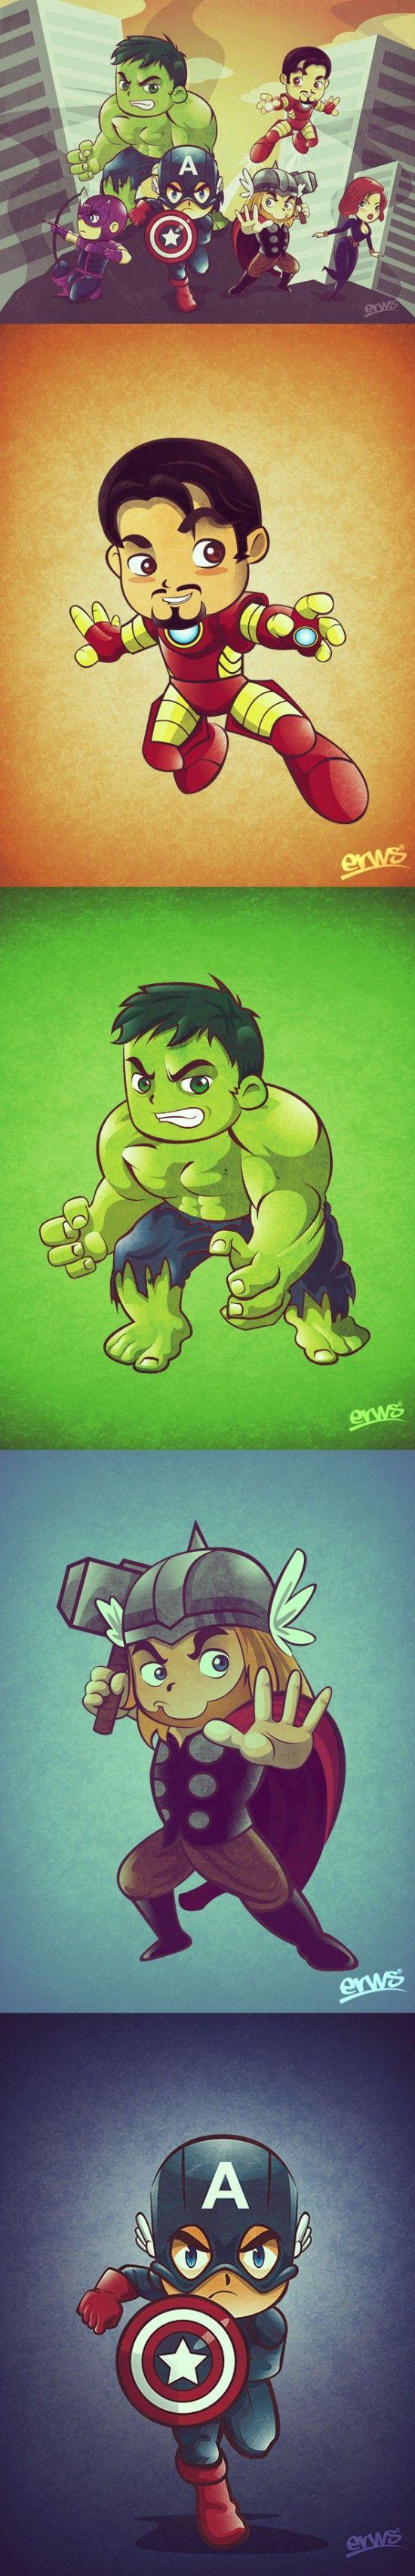 The Avengers - Fanart by Martin Erws.  mah, so cute